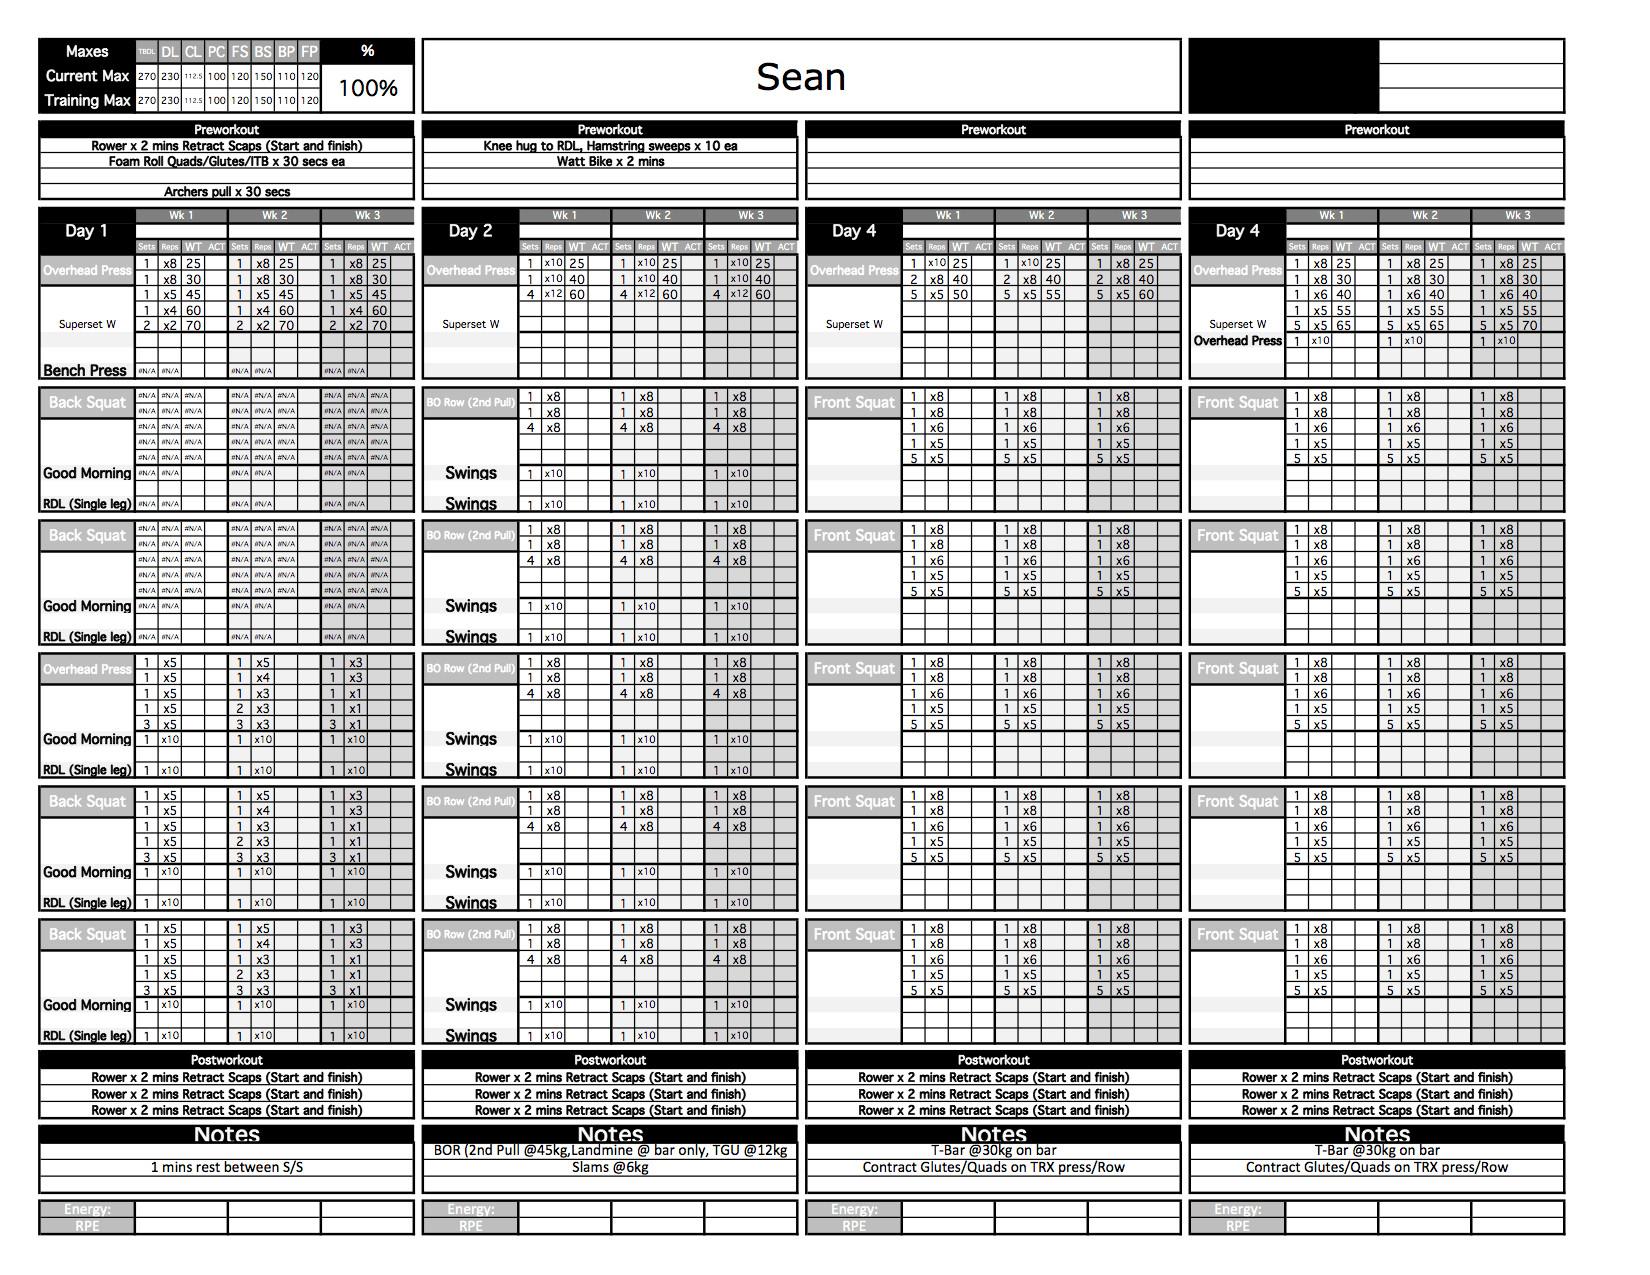 5x5 workout routine spreadsheet  u2013 db